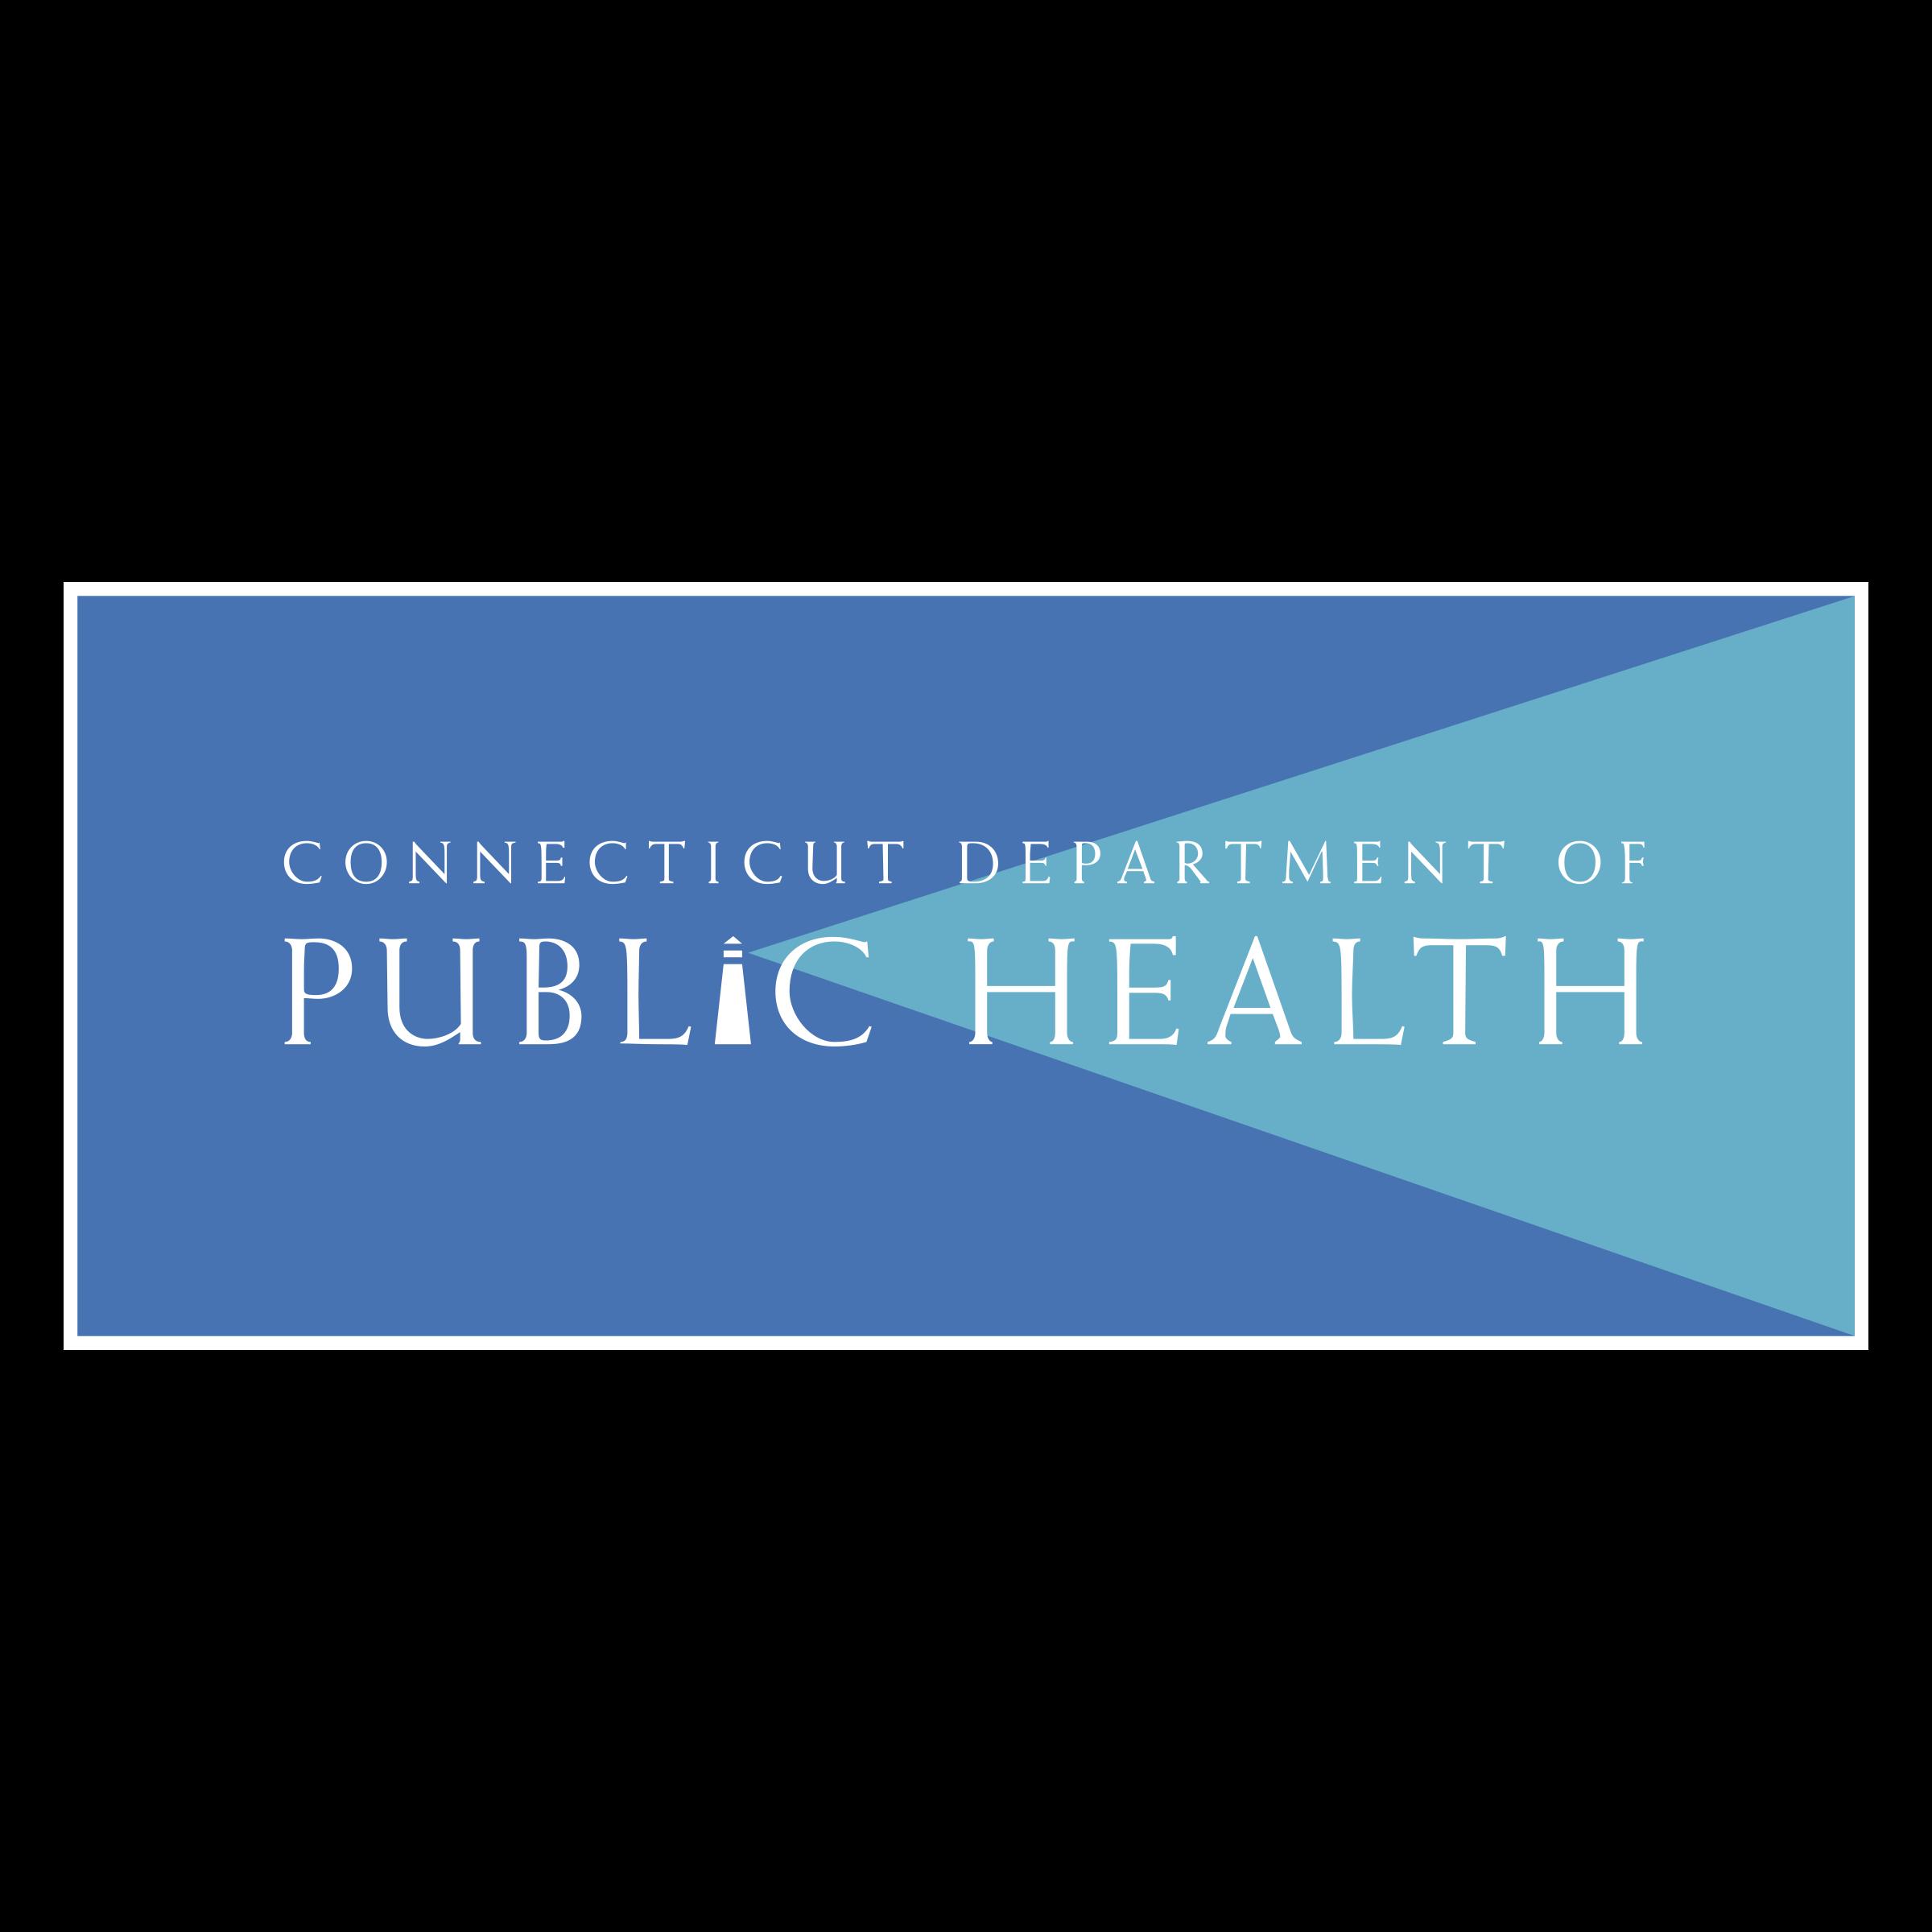 Public Health Logo Png Transparent Svg Vector Freebie Supply